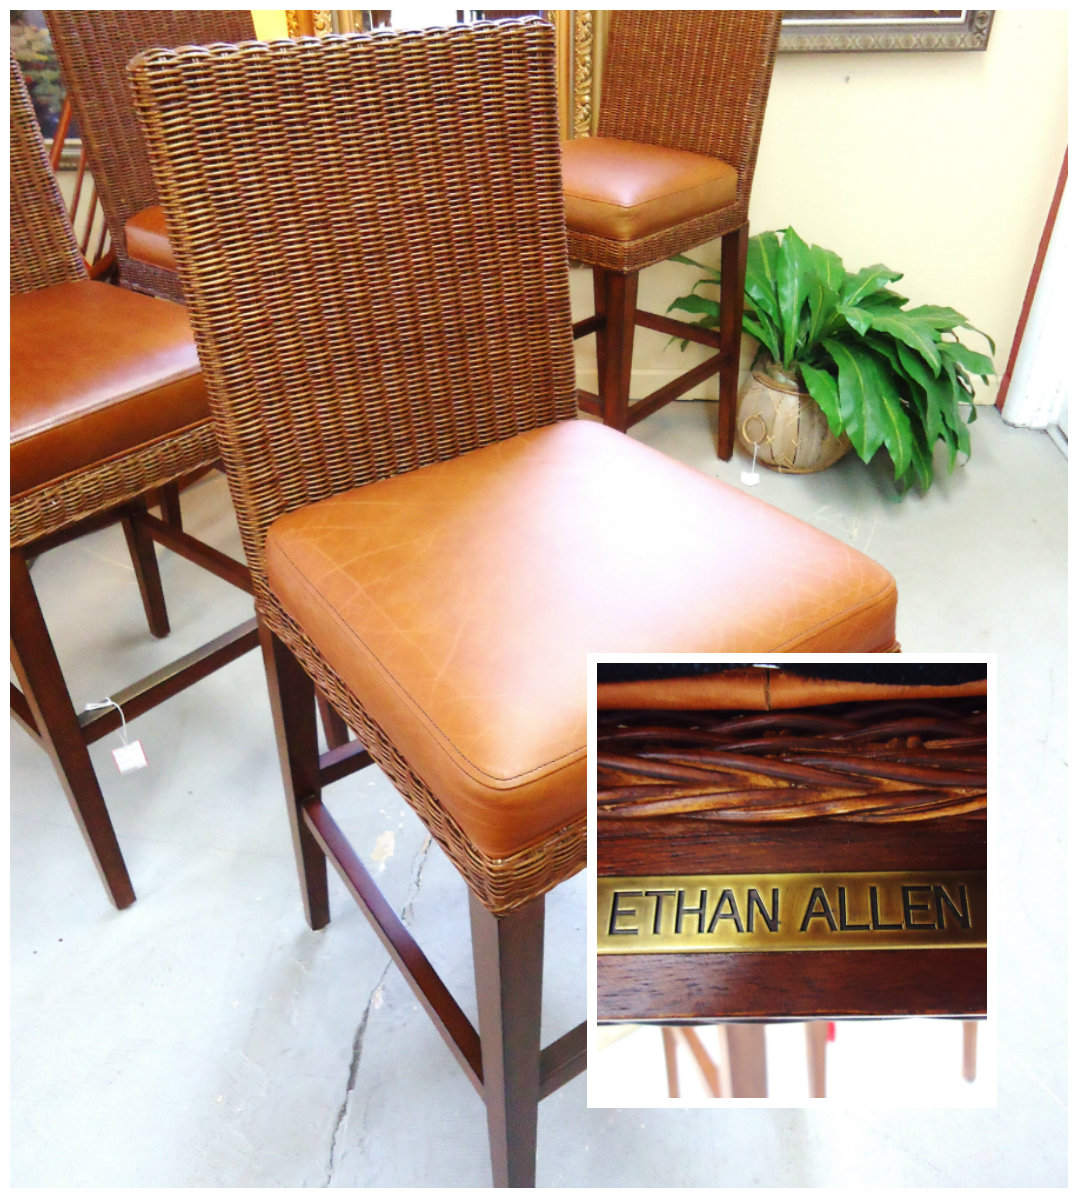 Ethan Allen Dining Room Credenza